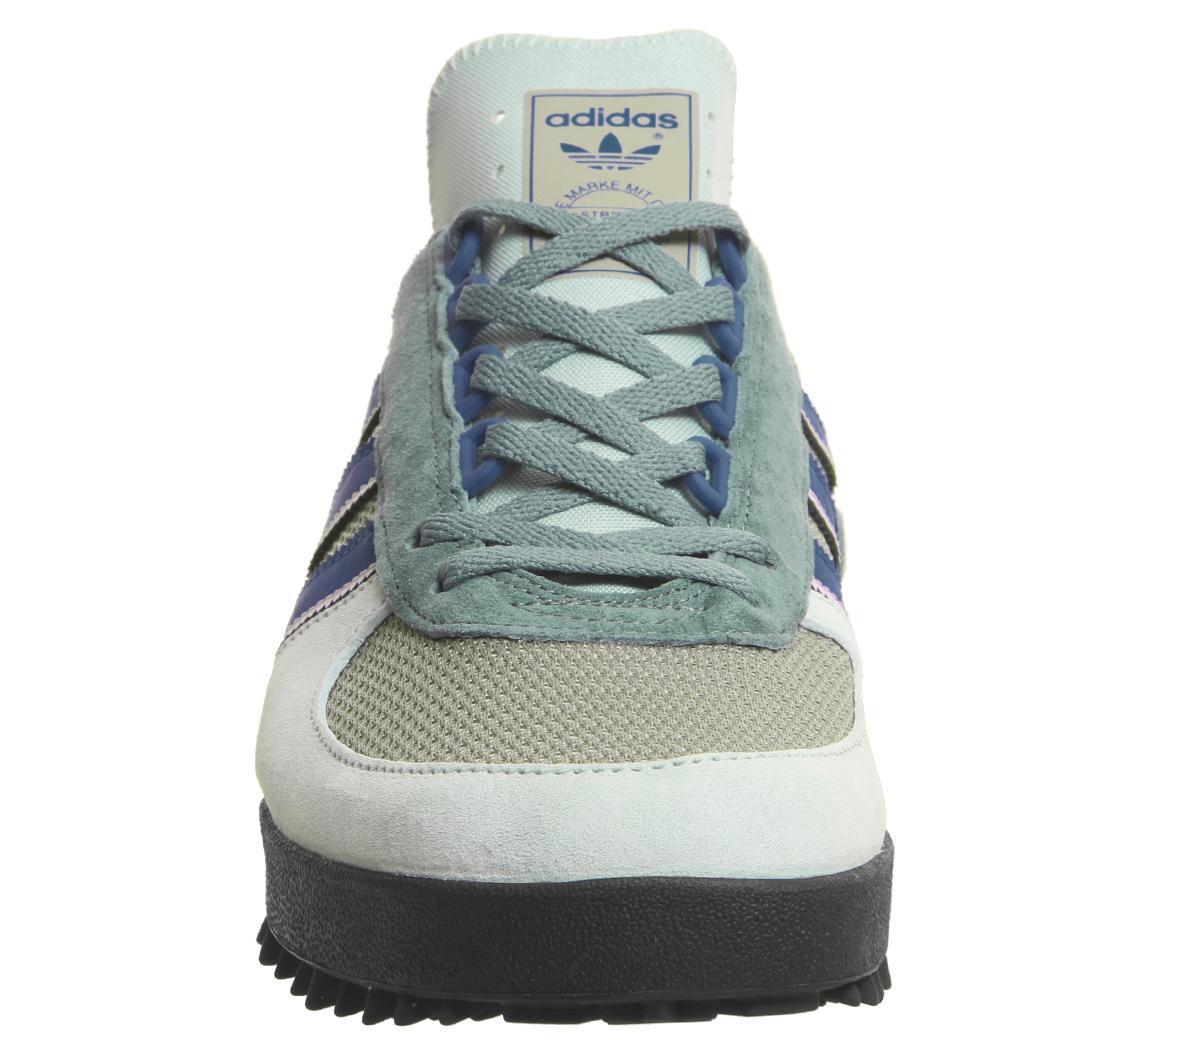 Authentic Adidas Originals Marathon TR ® (Men Size 8 11) Ash Green Chalk White